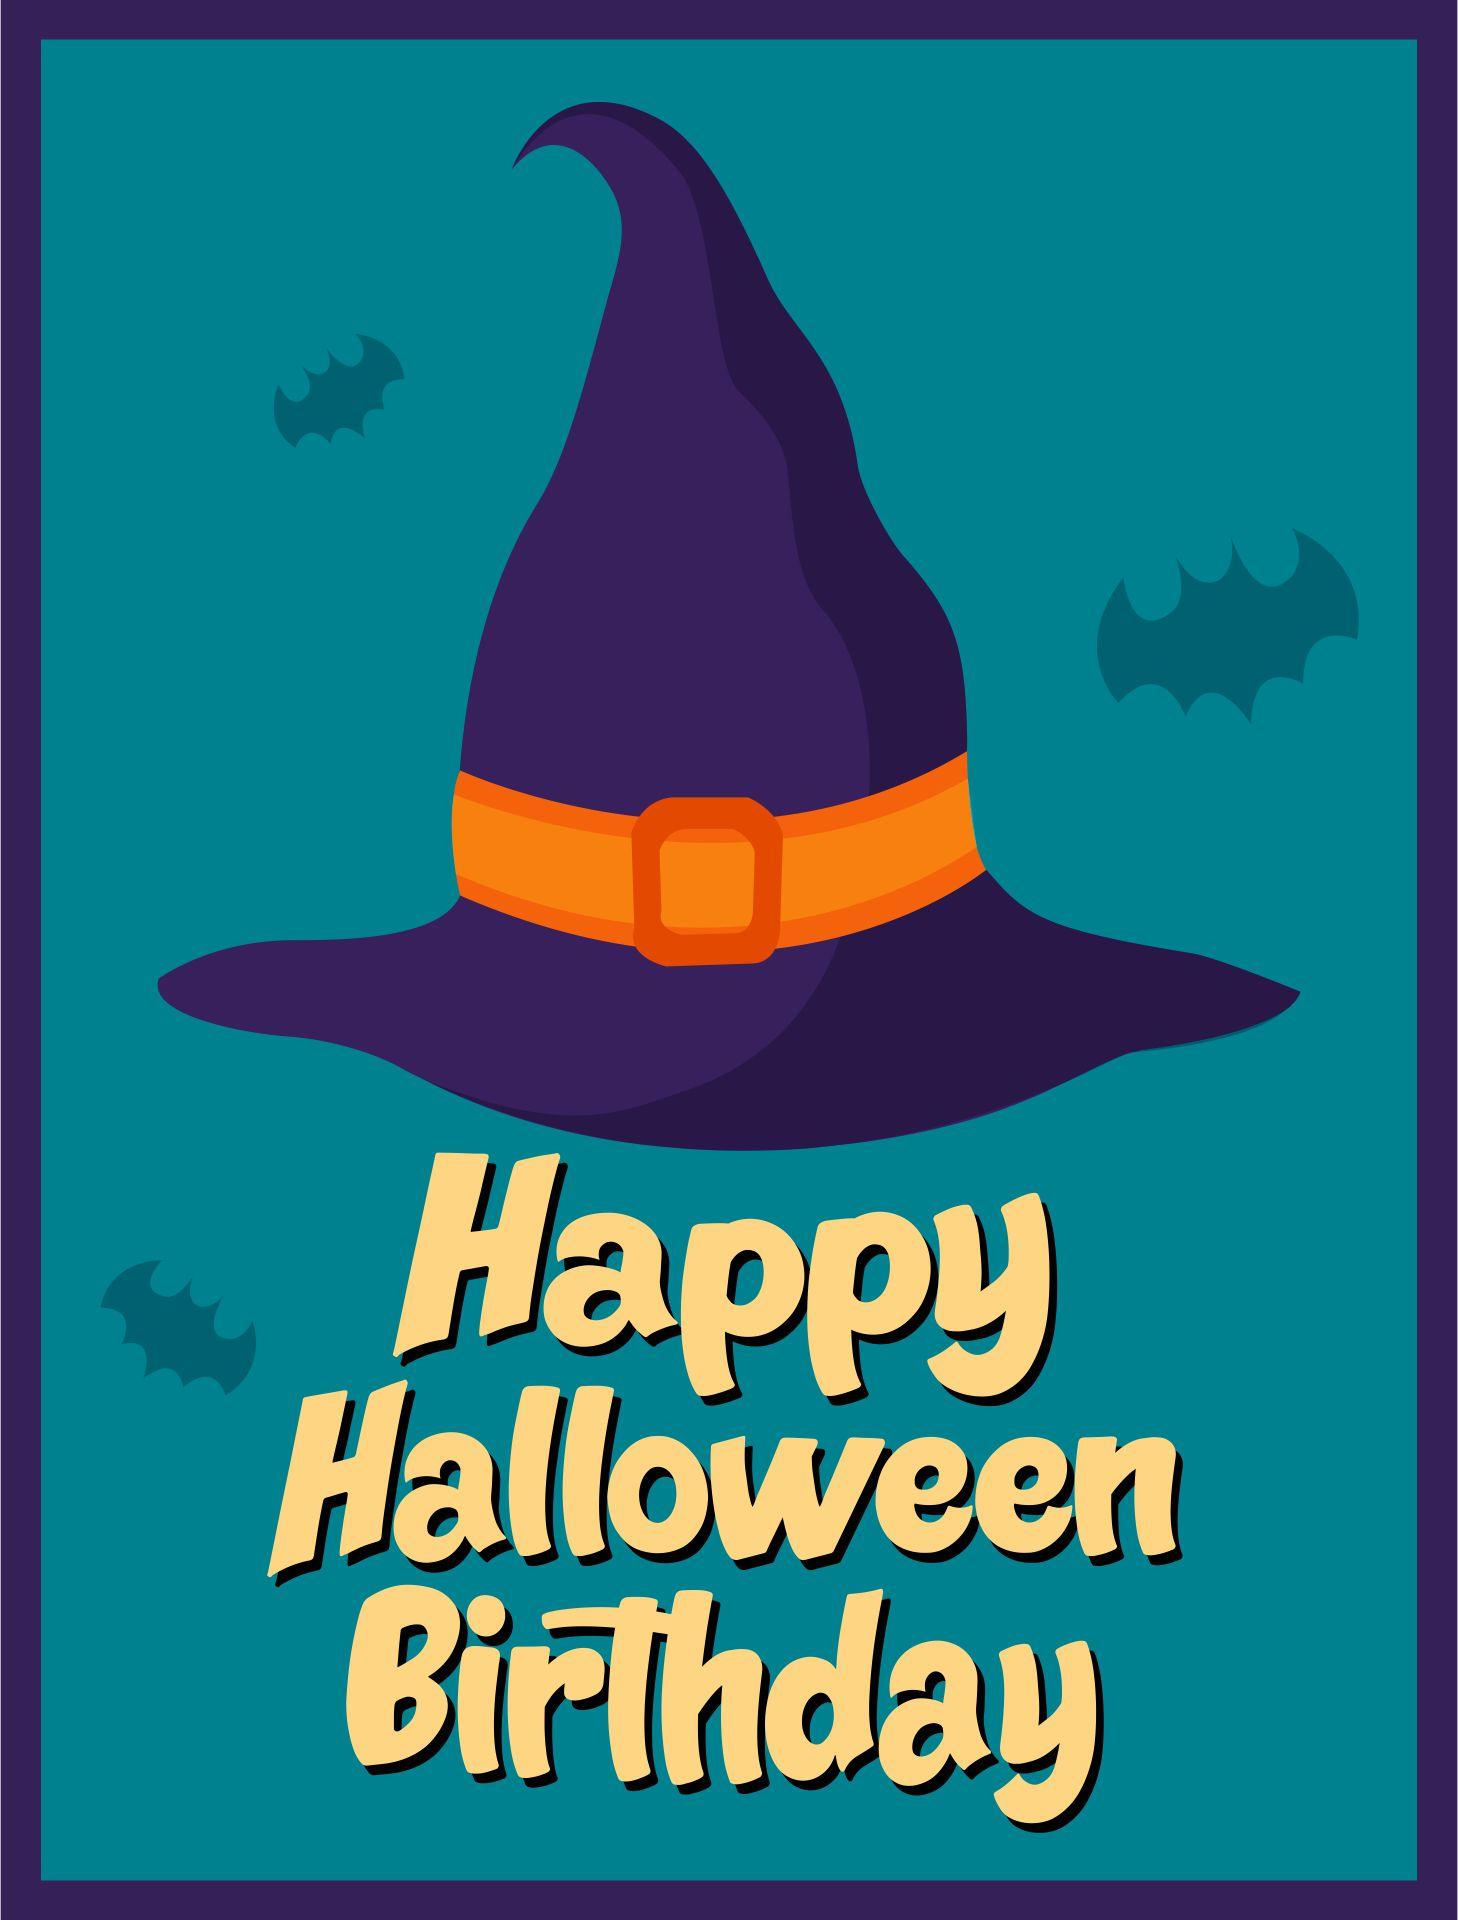 Have A Happy Halloween Birthday